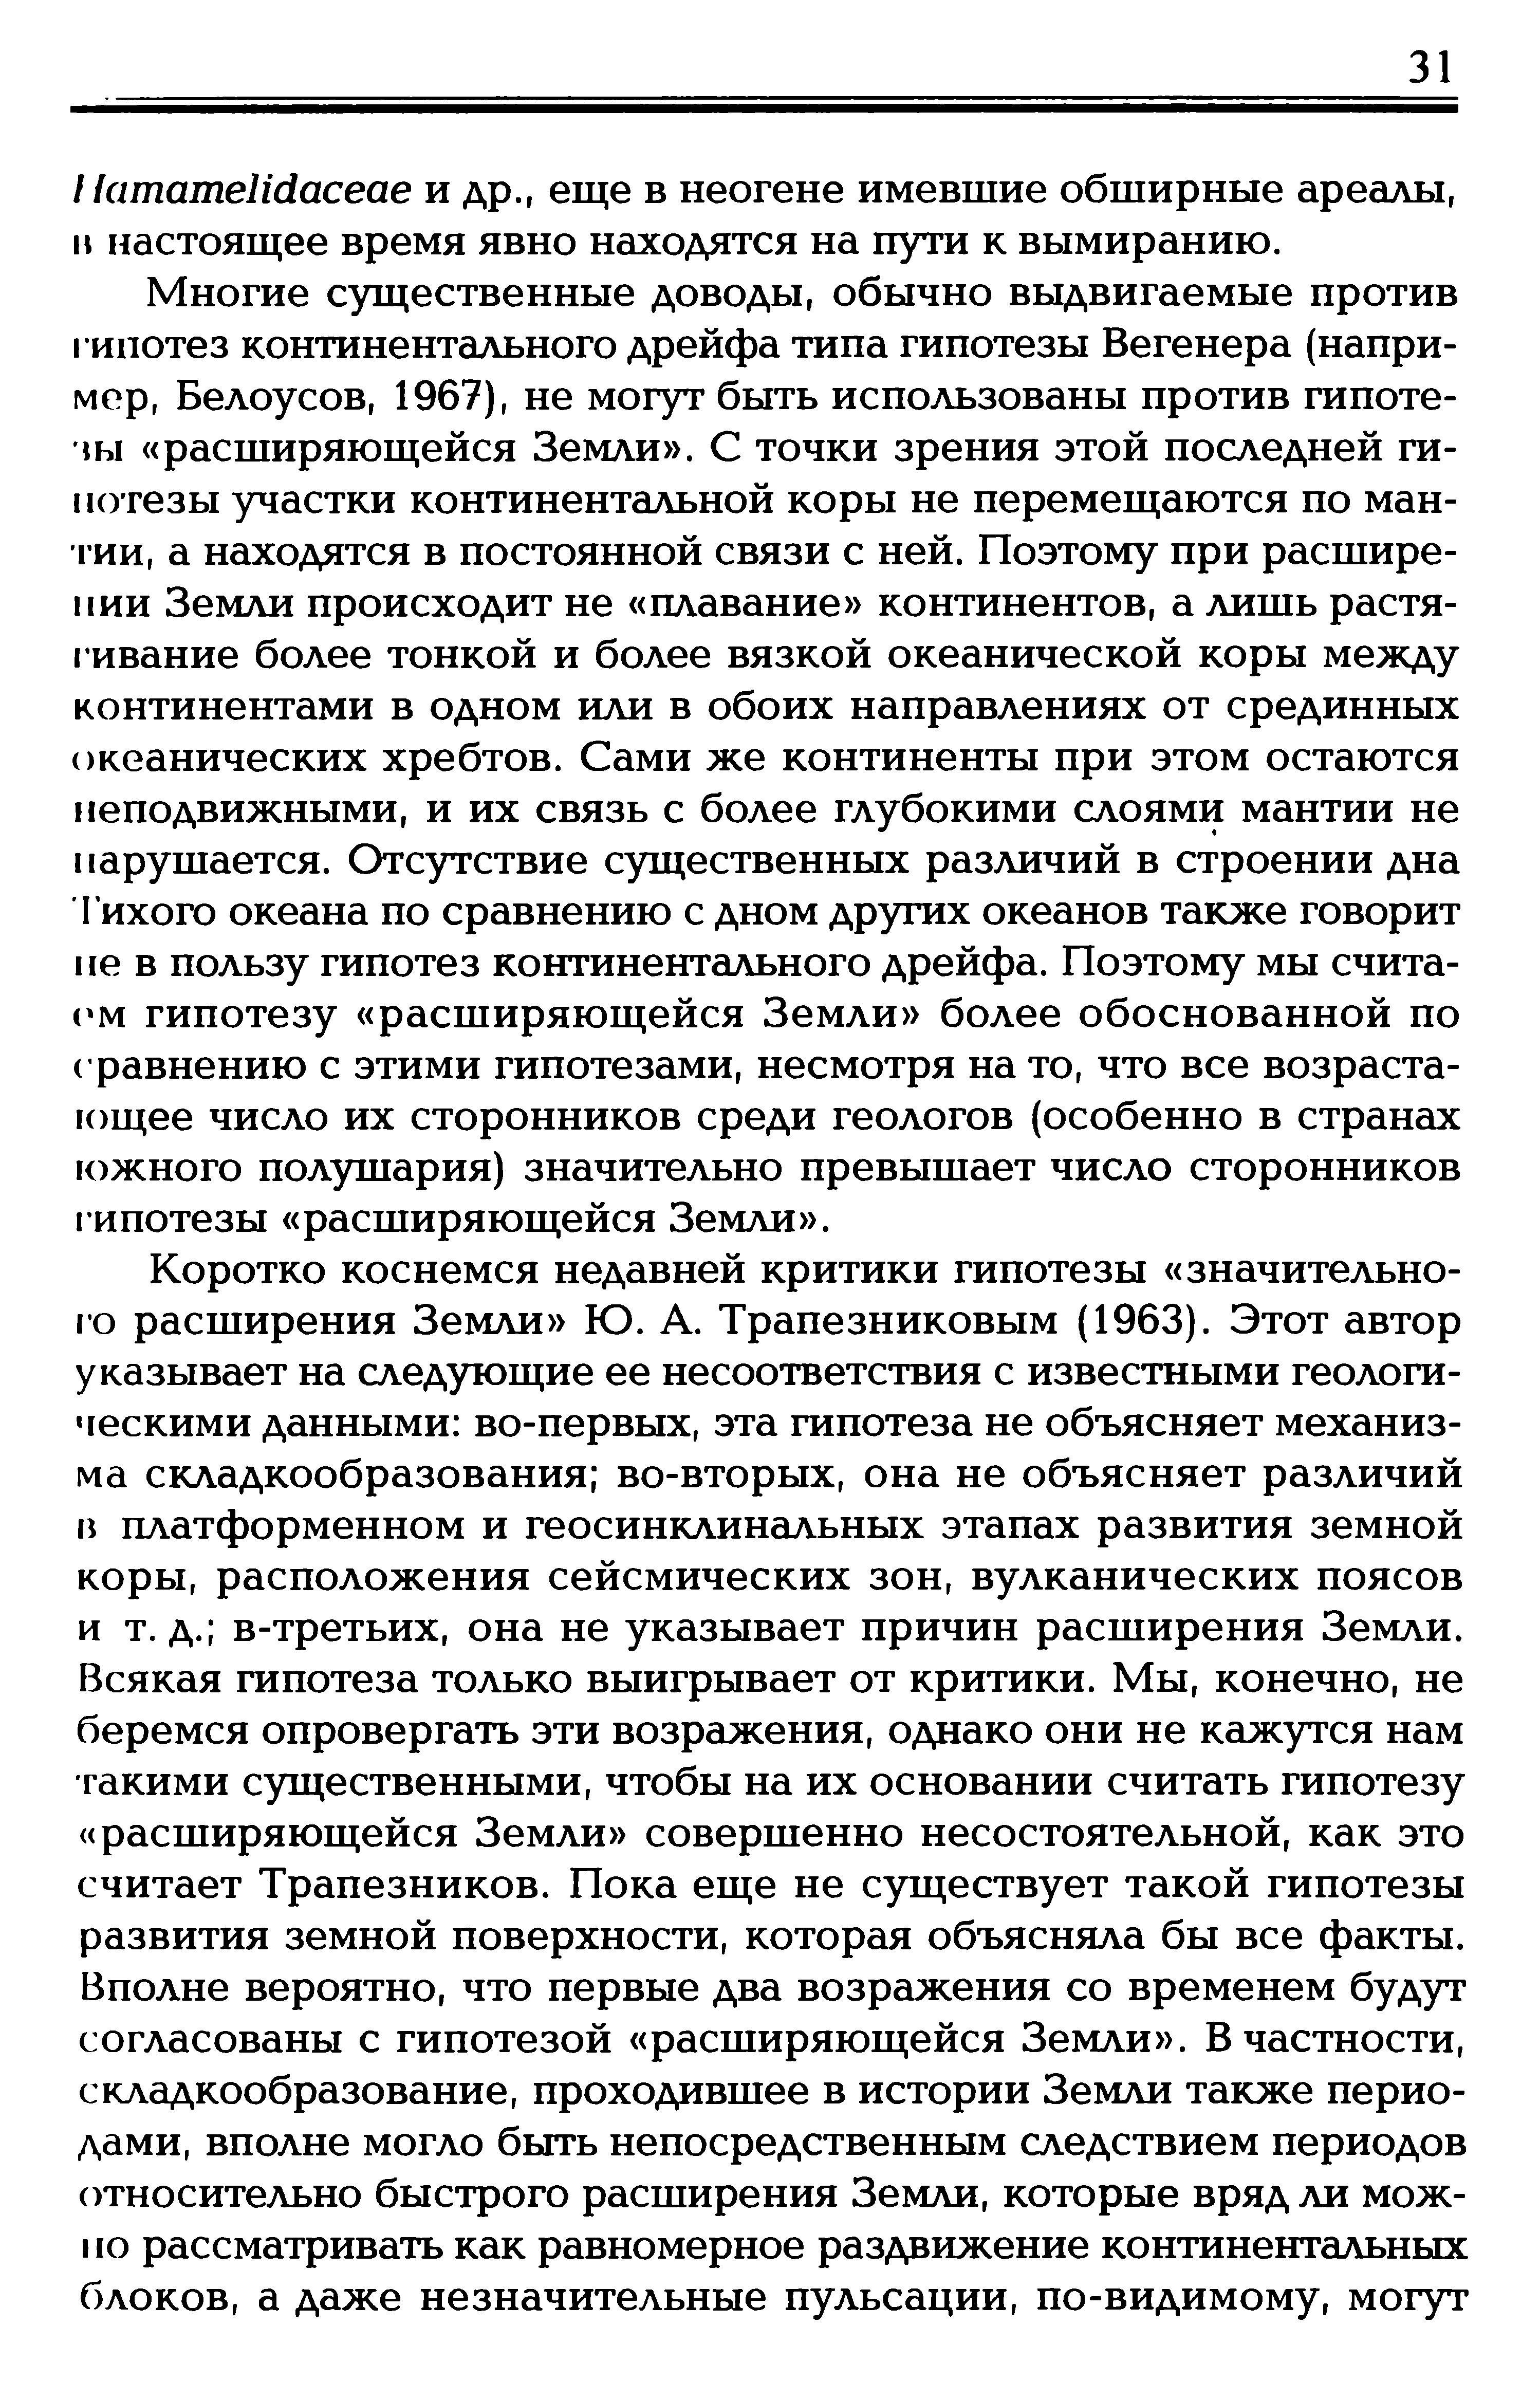 Tzvelev, 2005_1_12.jpeg